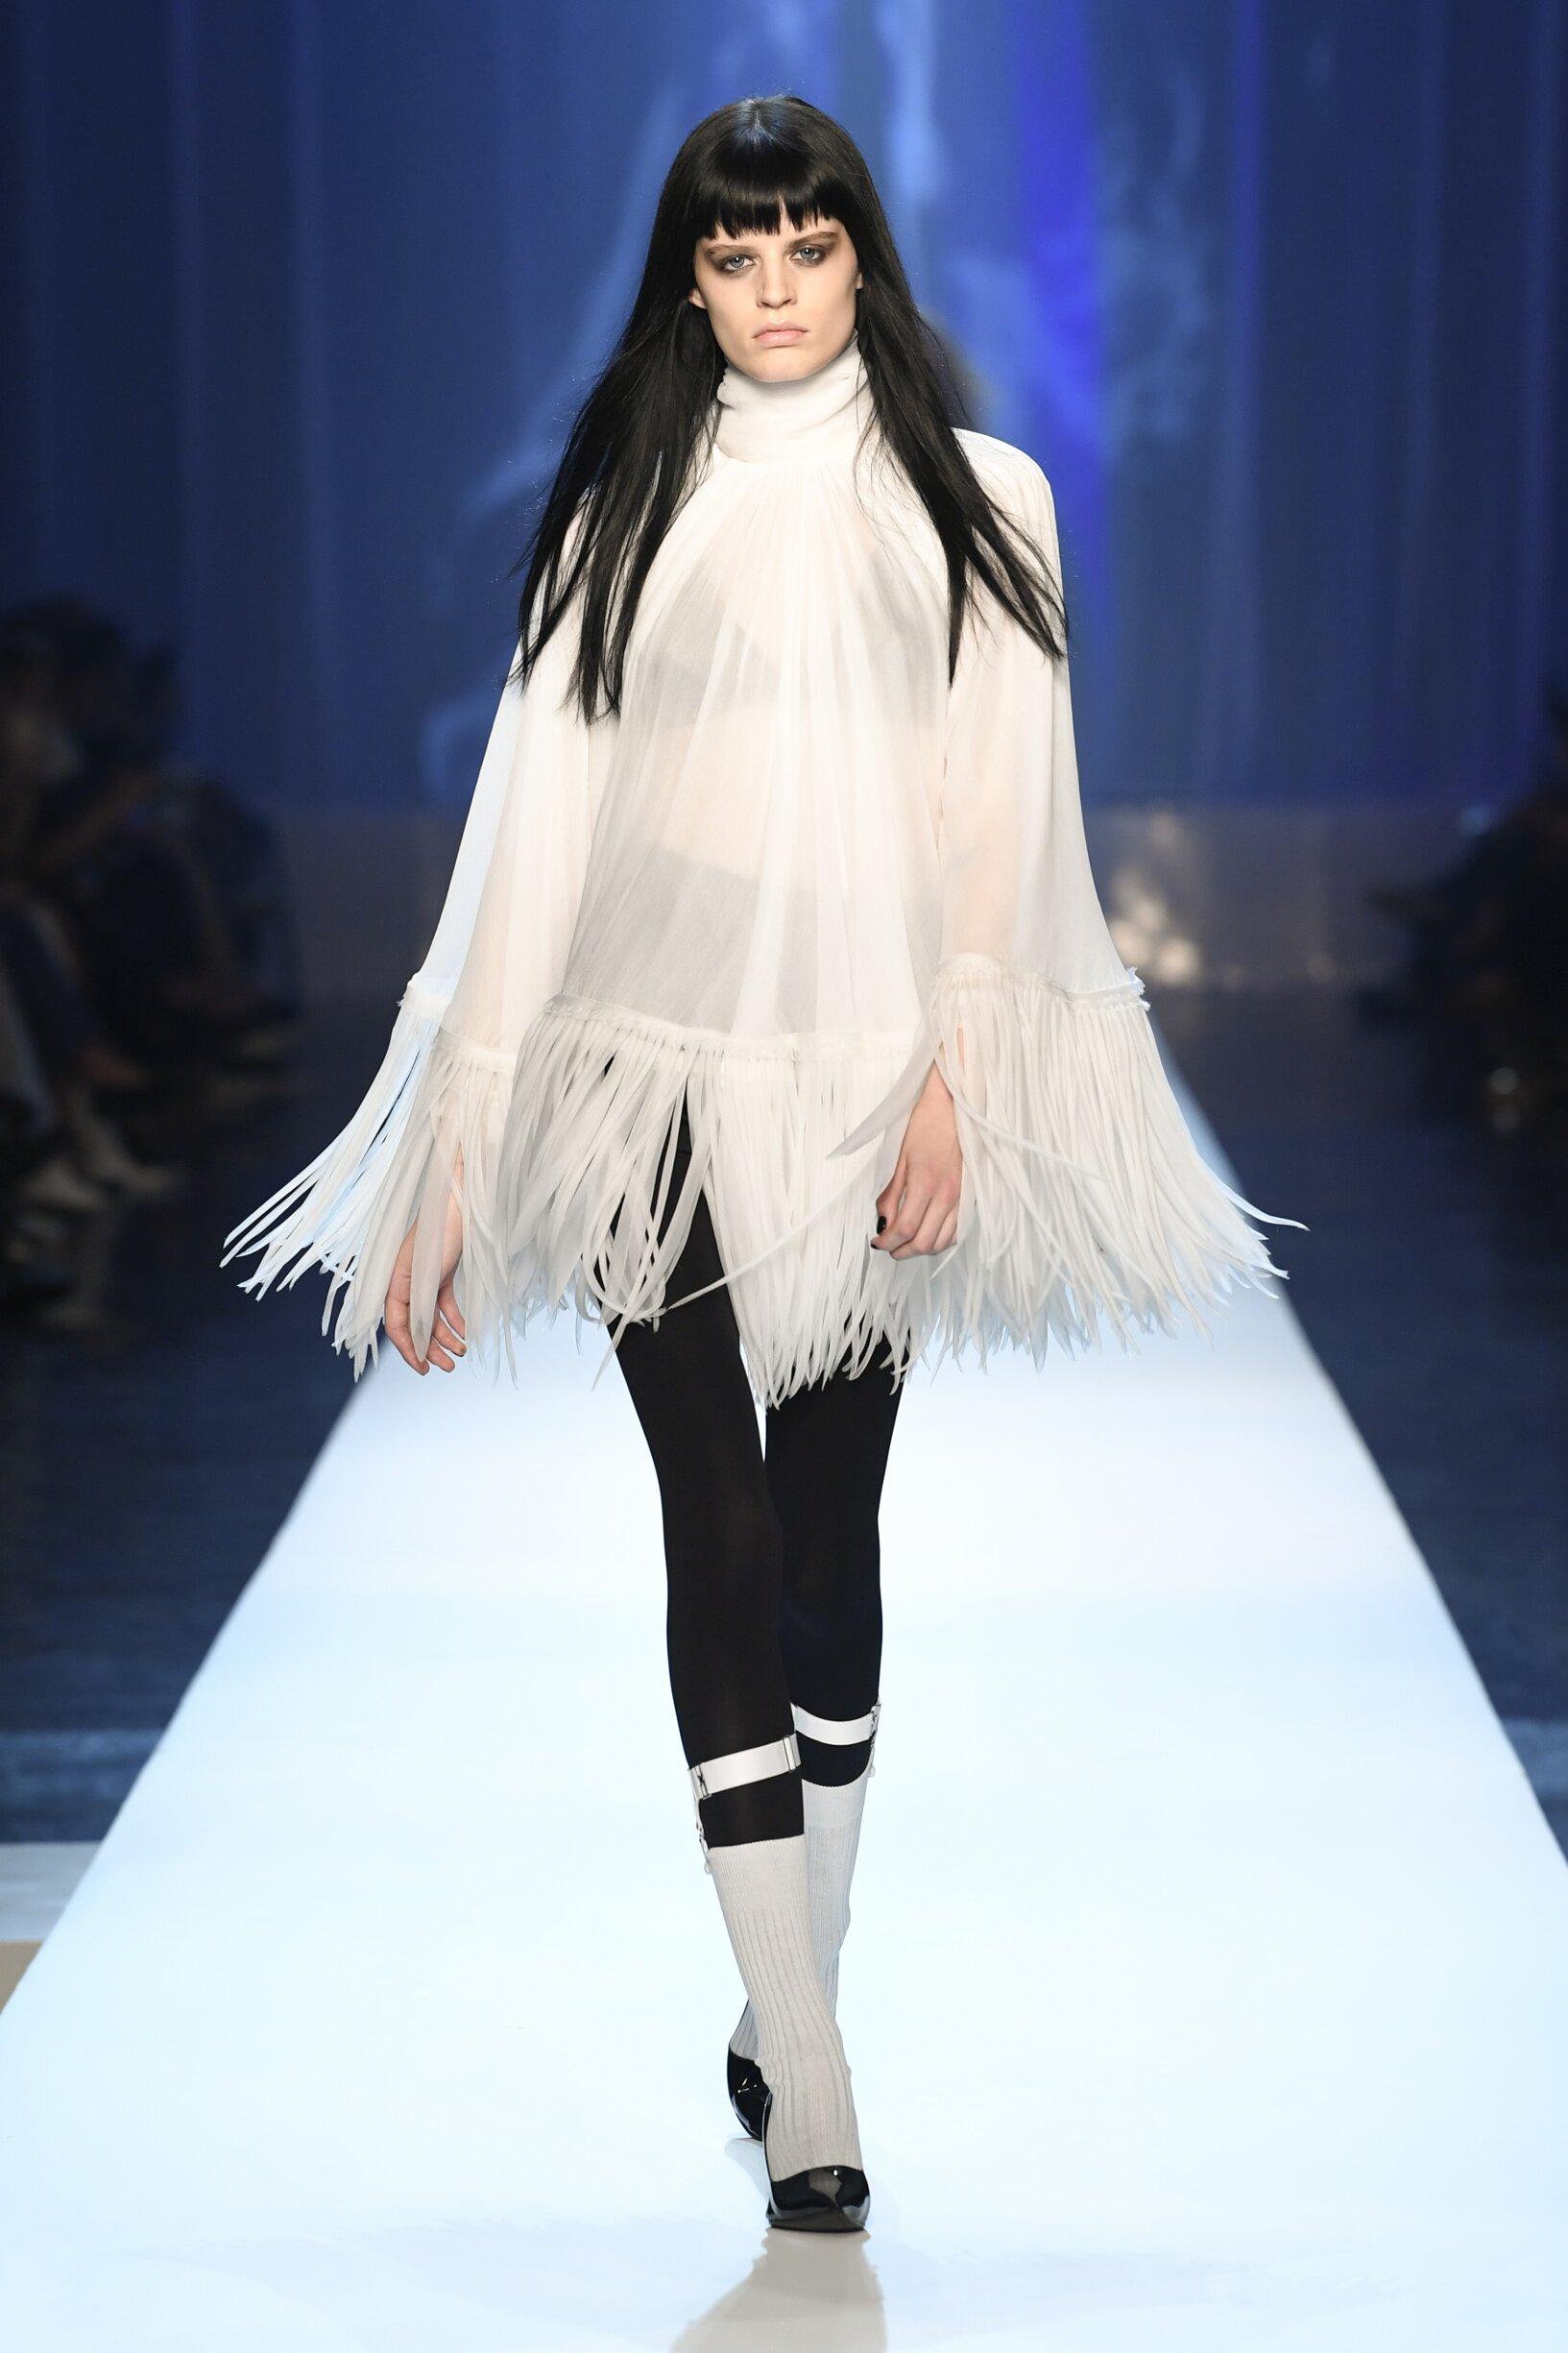 Jean-Paul Gaultier Haute Couture Women's Collection 2018 19